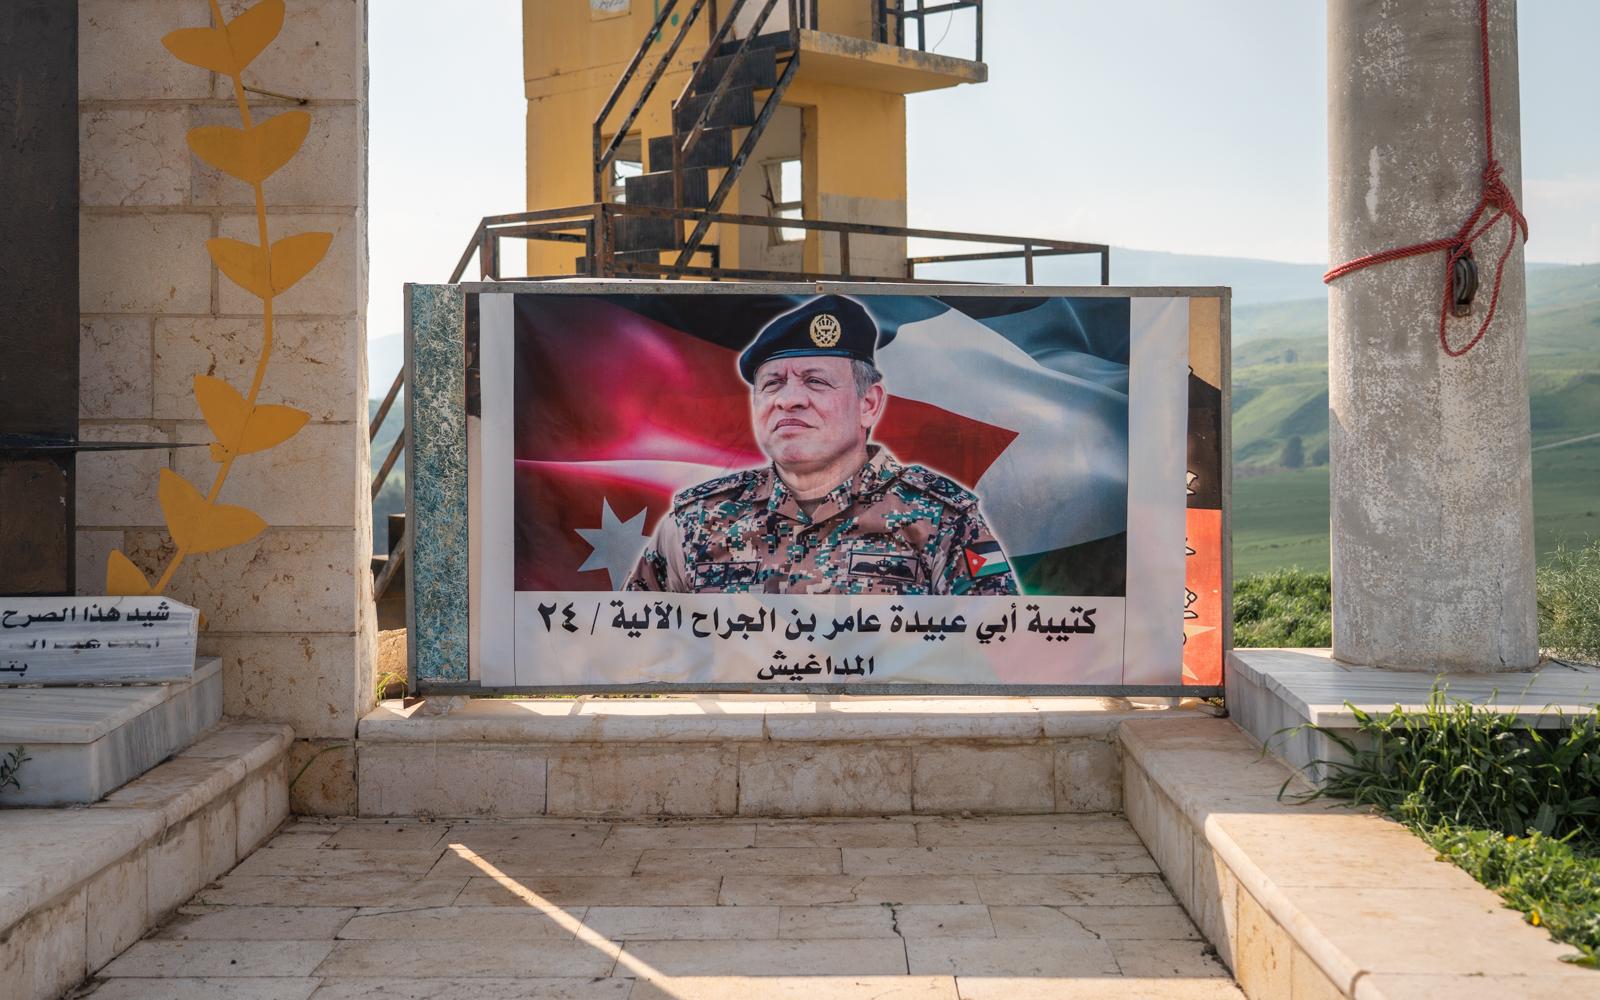 A poster of King Abdullah II of Jordan at the Island of Peace, January 29, 2019. (Luke Tress/Times of Israel)